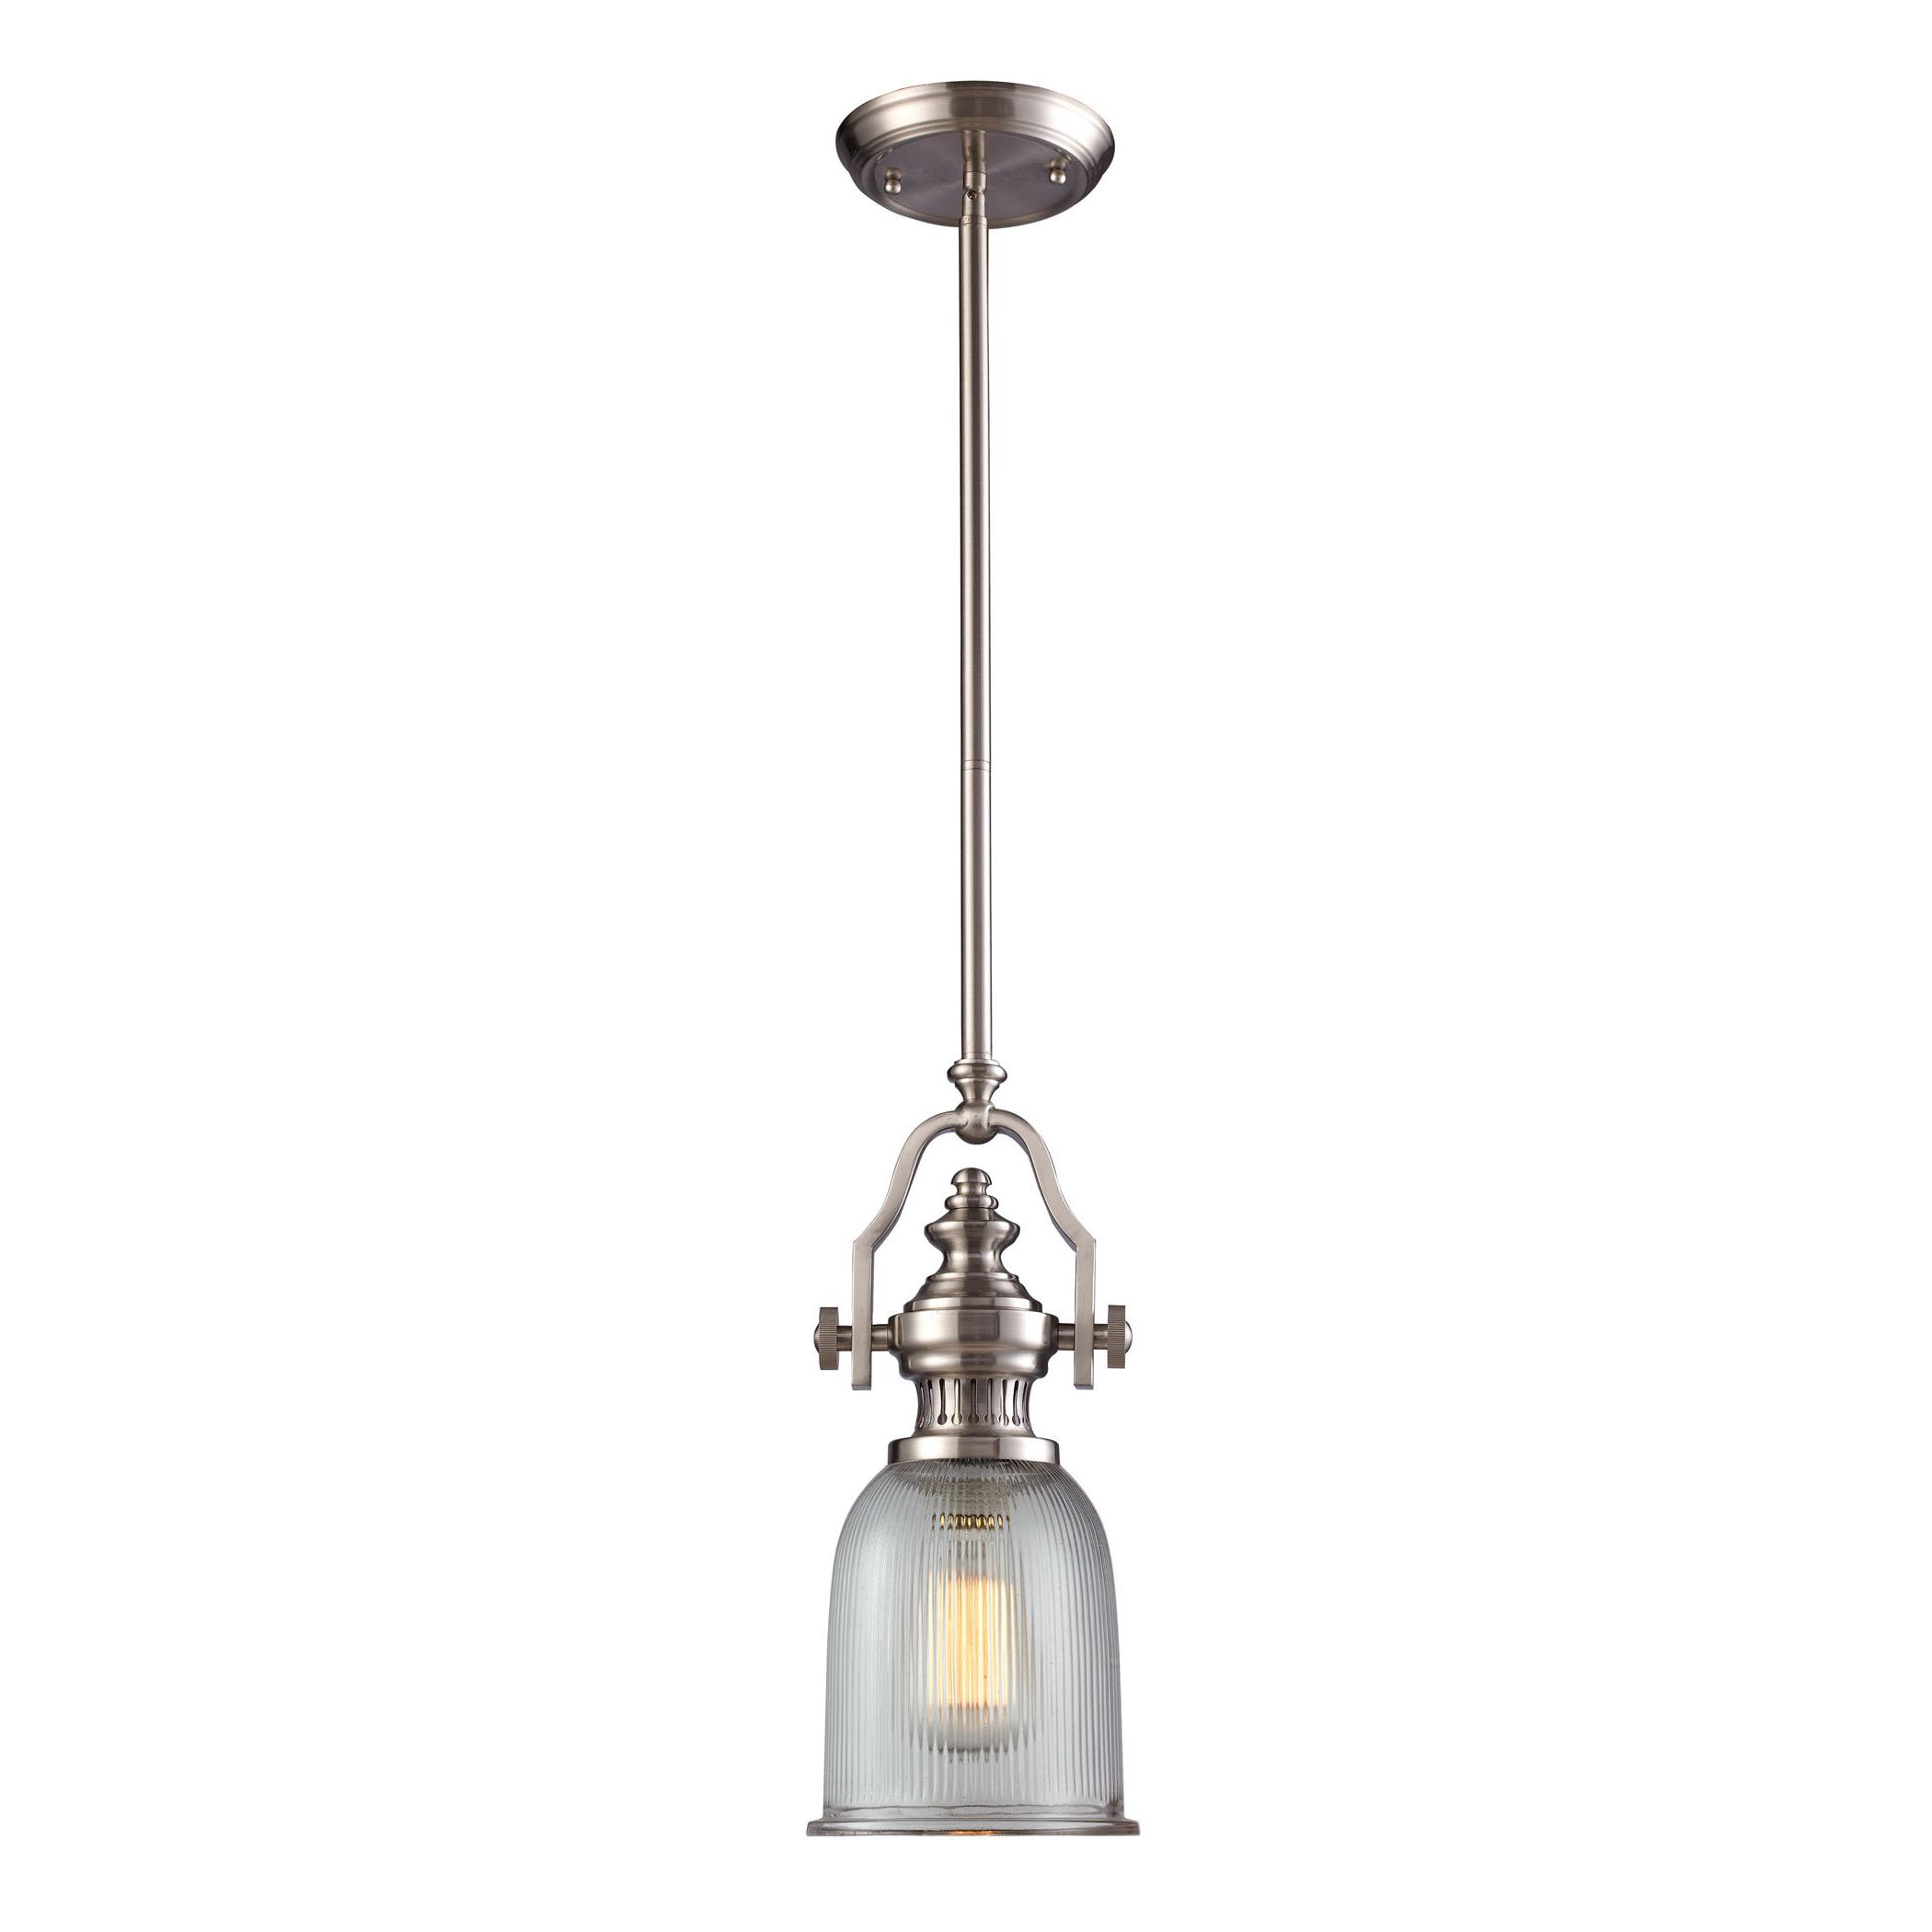 Famous Erico 1 Light Single Bell Pendants Pertaining To Erico 1 Light Single Bell Pendant (Gallery 3 of 20)